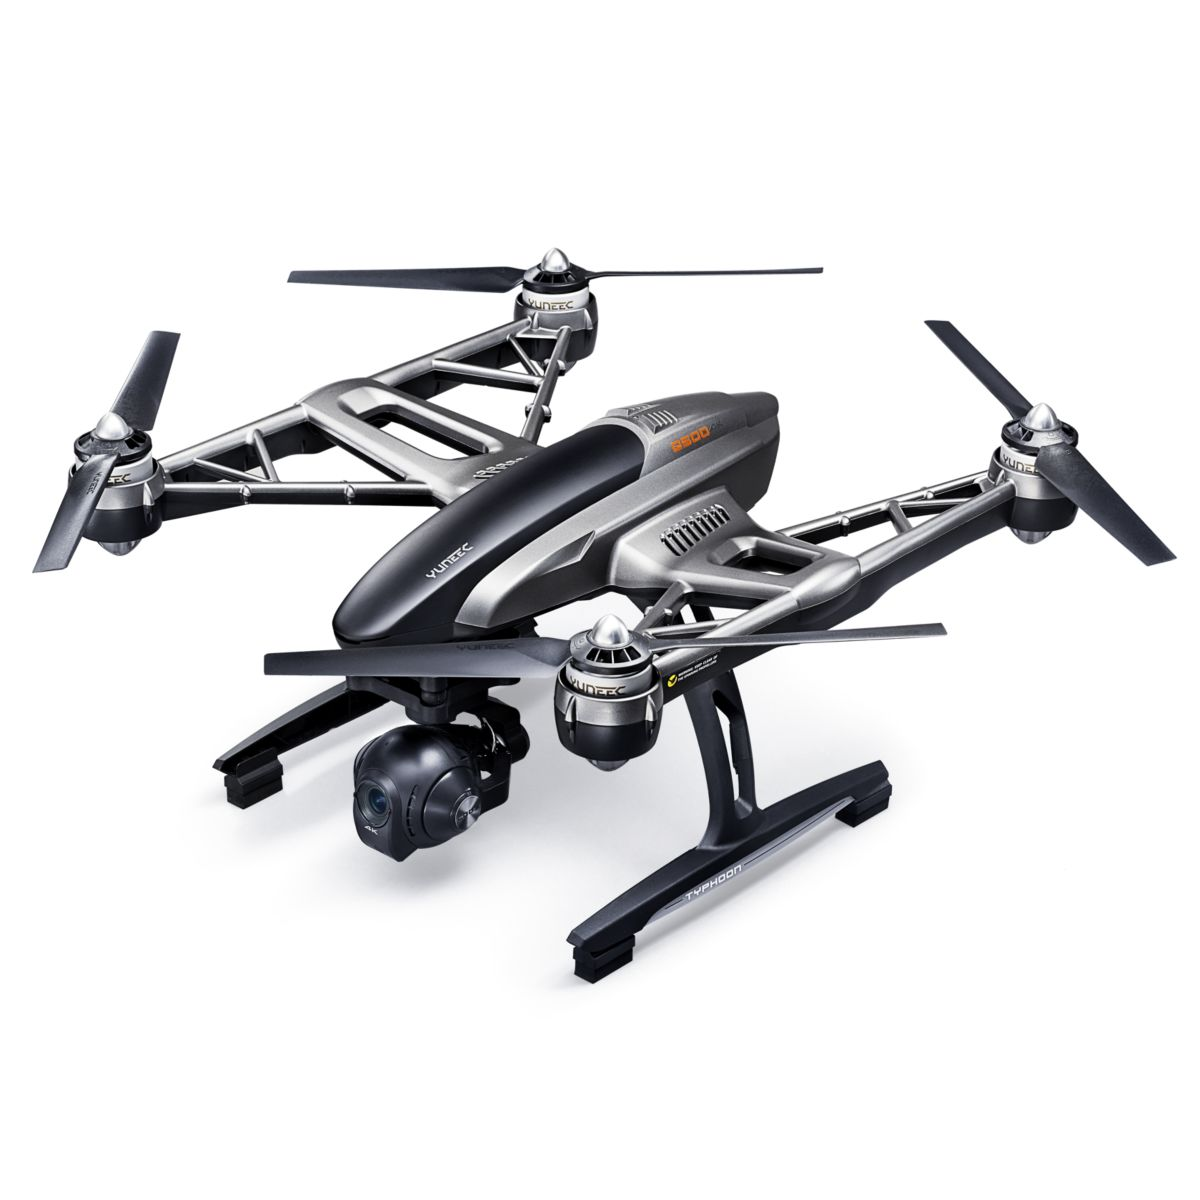 Drone YUNEEC Q500 Typhoon 4K